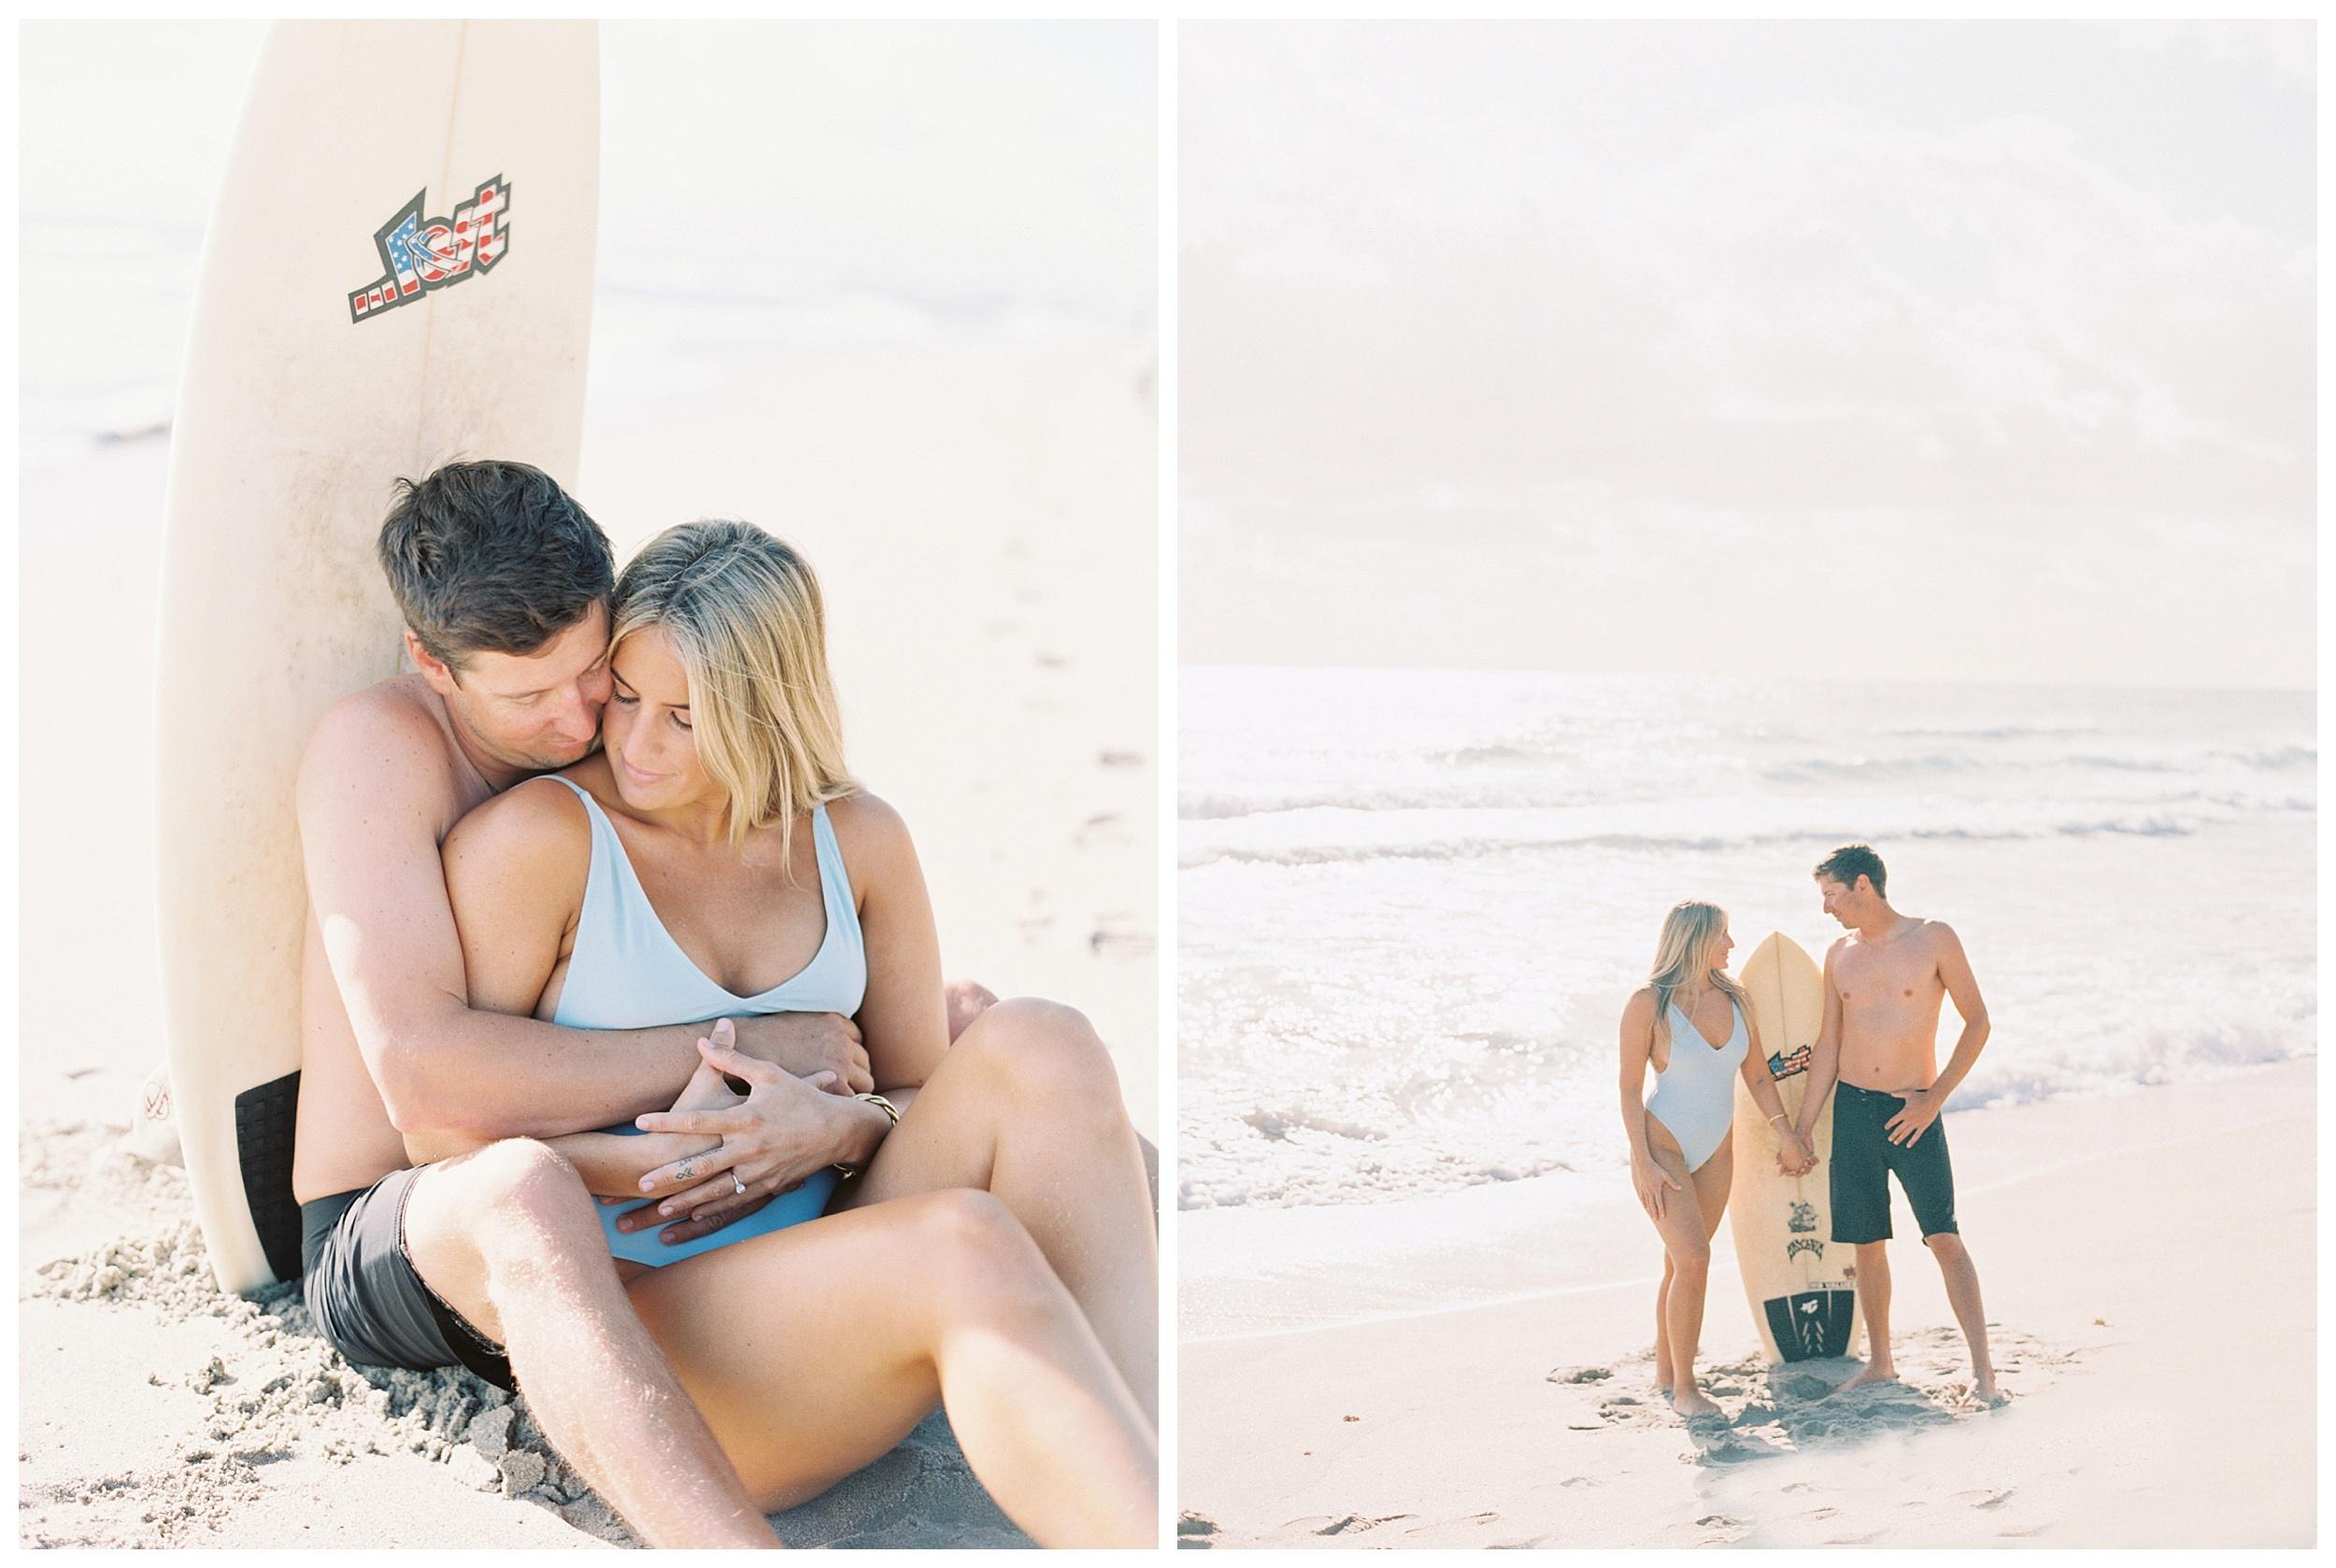 Surfboard Engagement Florida Wedding Photographer Kir Tuben_0016.jpg